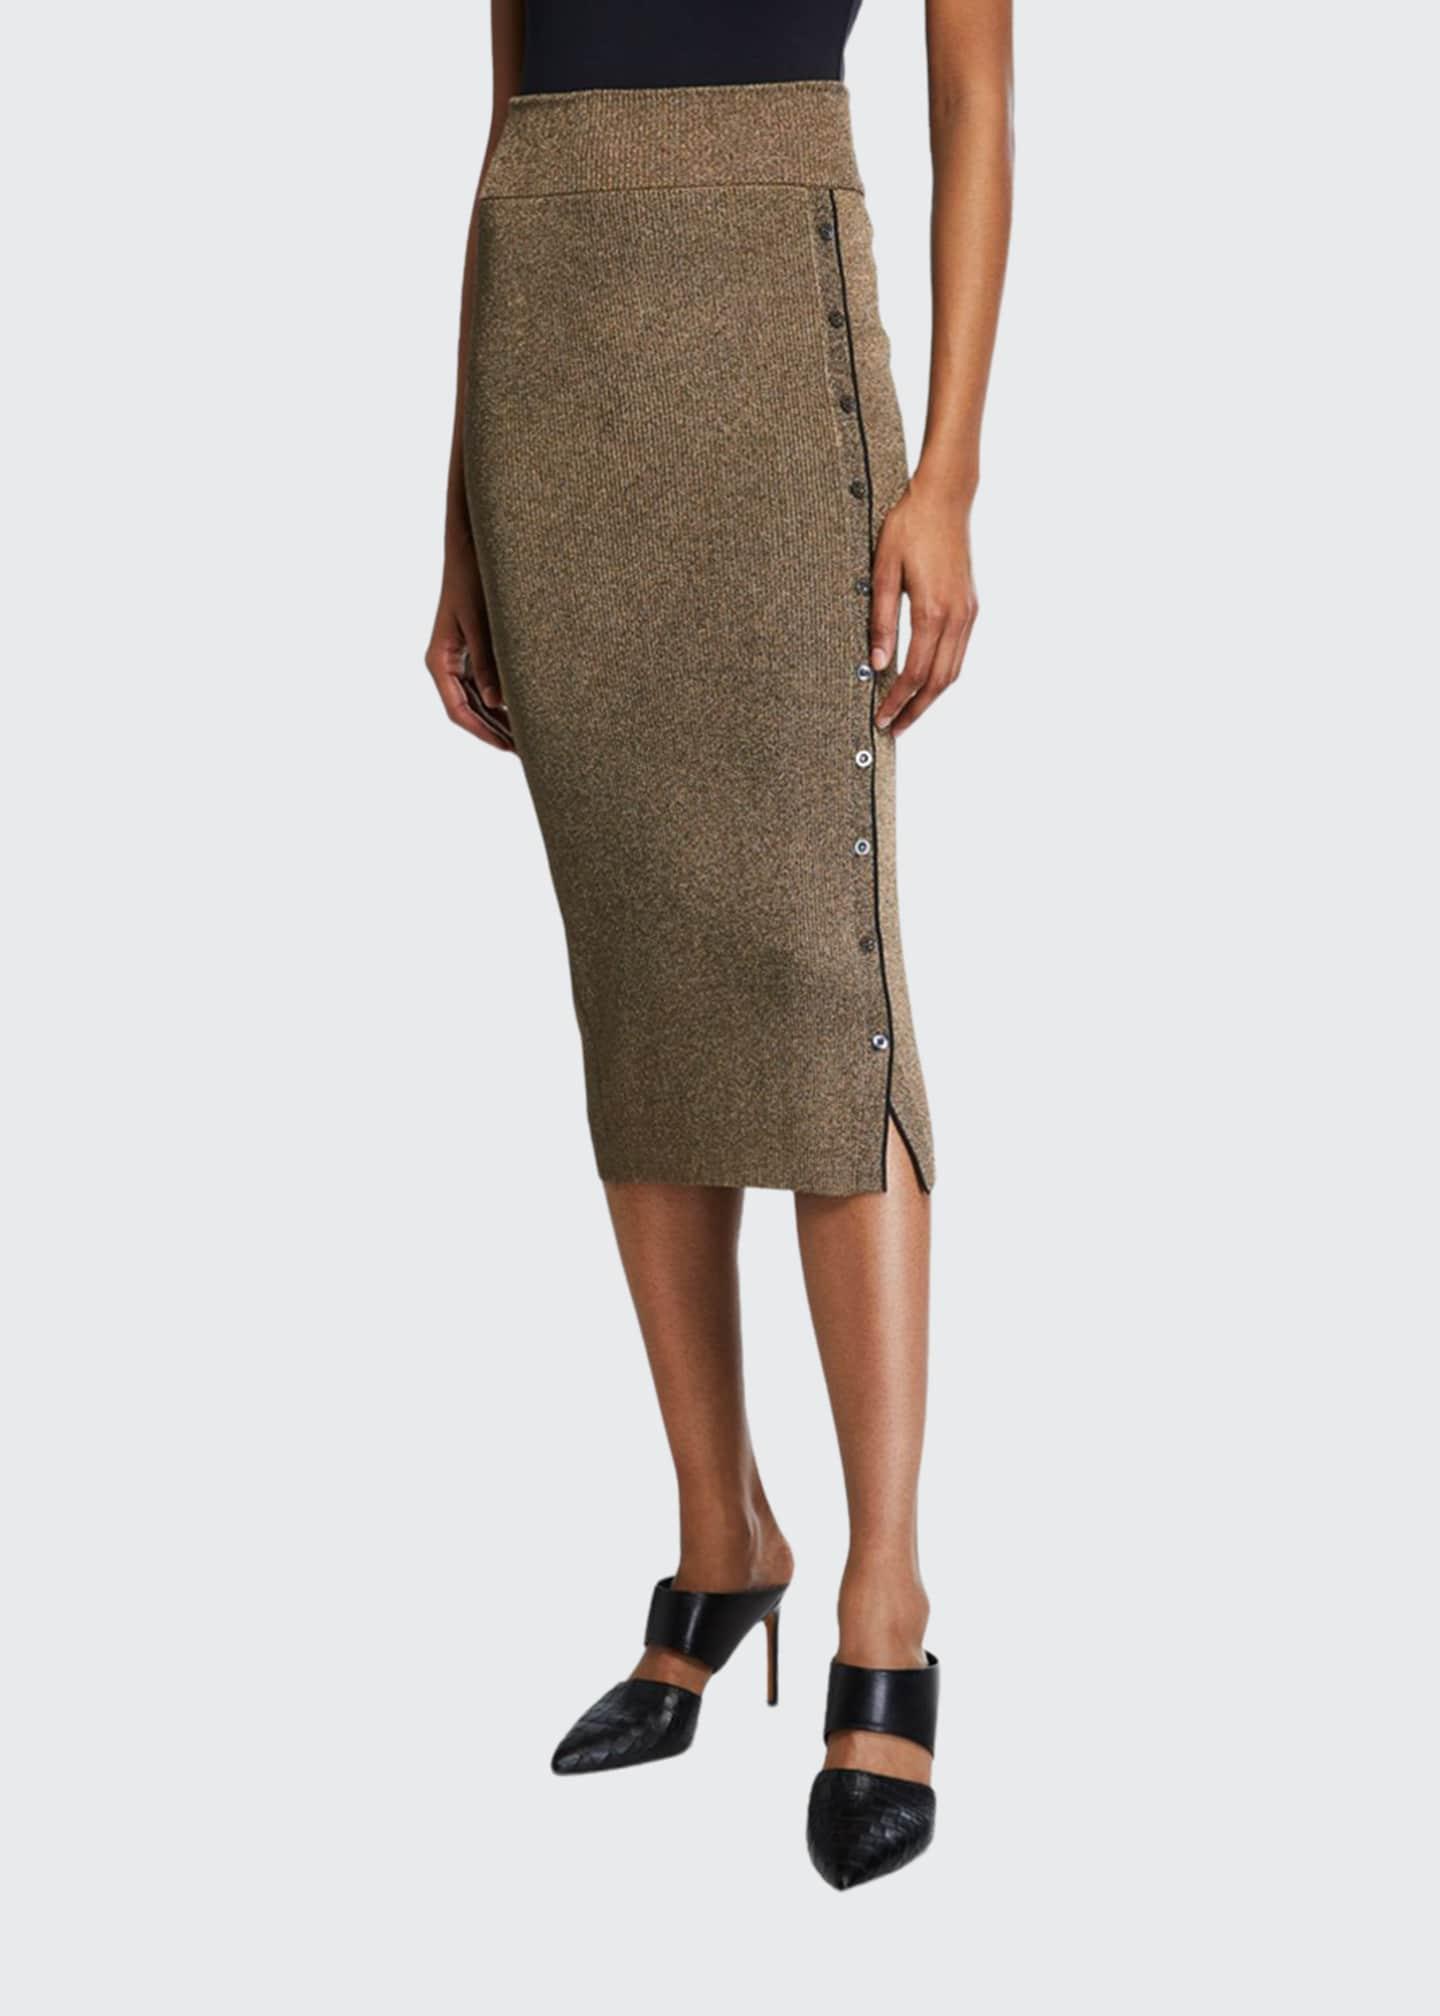 Jonathan Simkhai Metallic Rib Button-Front Midi Skirt